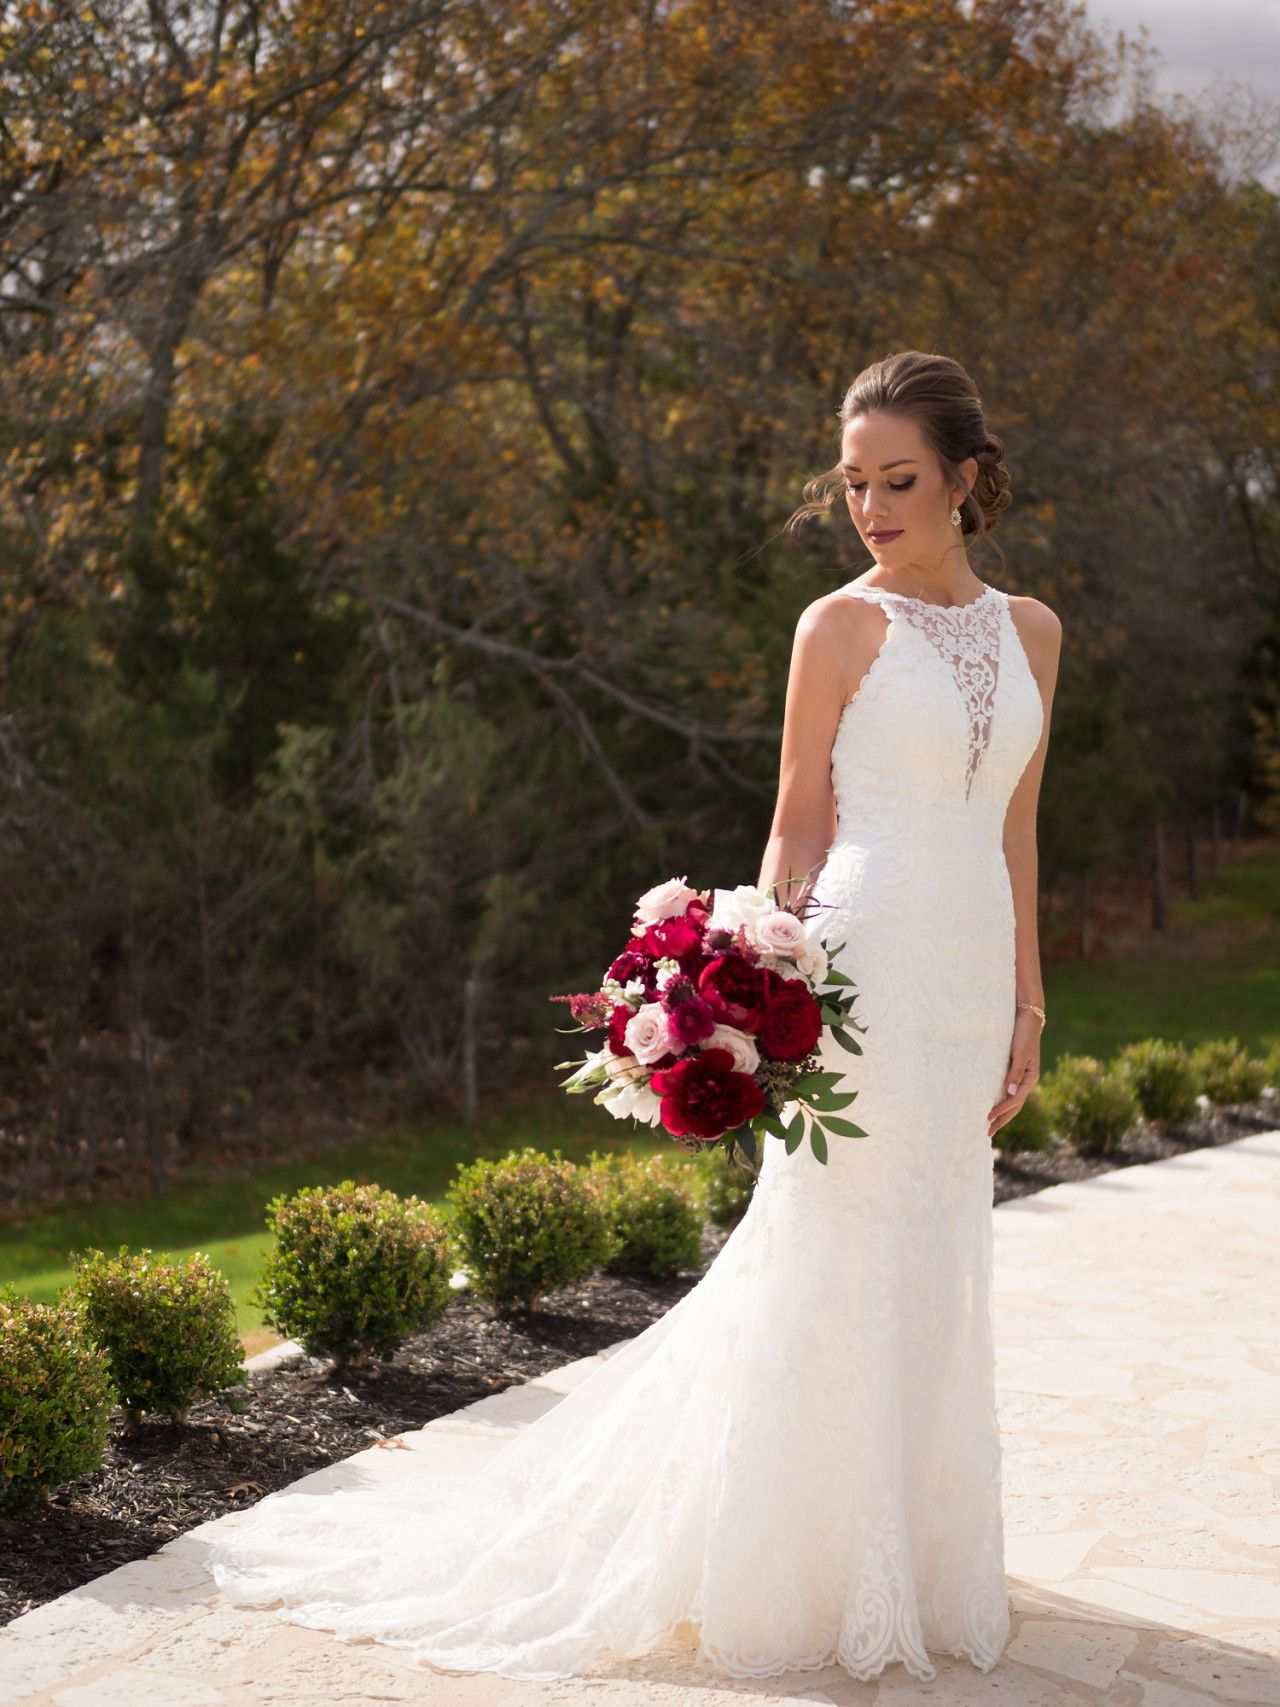 Mckinney Reception Halls Springs Venue Fitted Wedding Gown Elegant Wedding Dress Wedding Dresses [ 1707 x 1280 Pixel ]